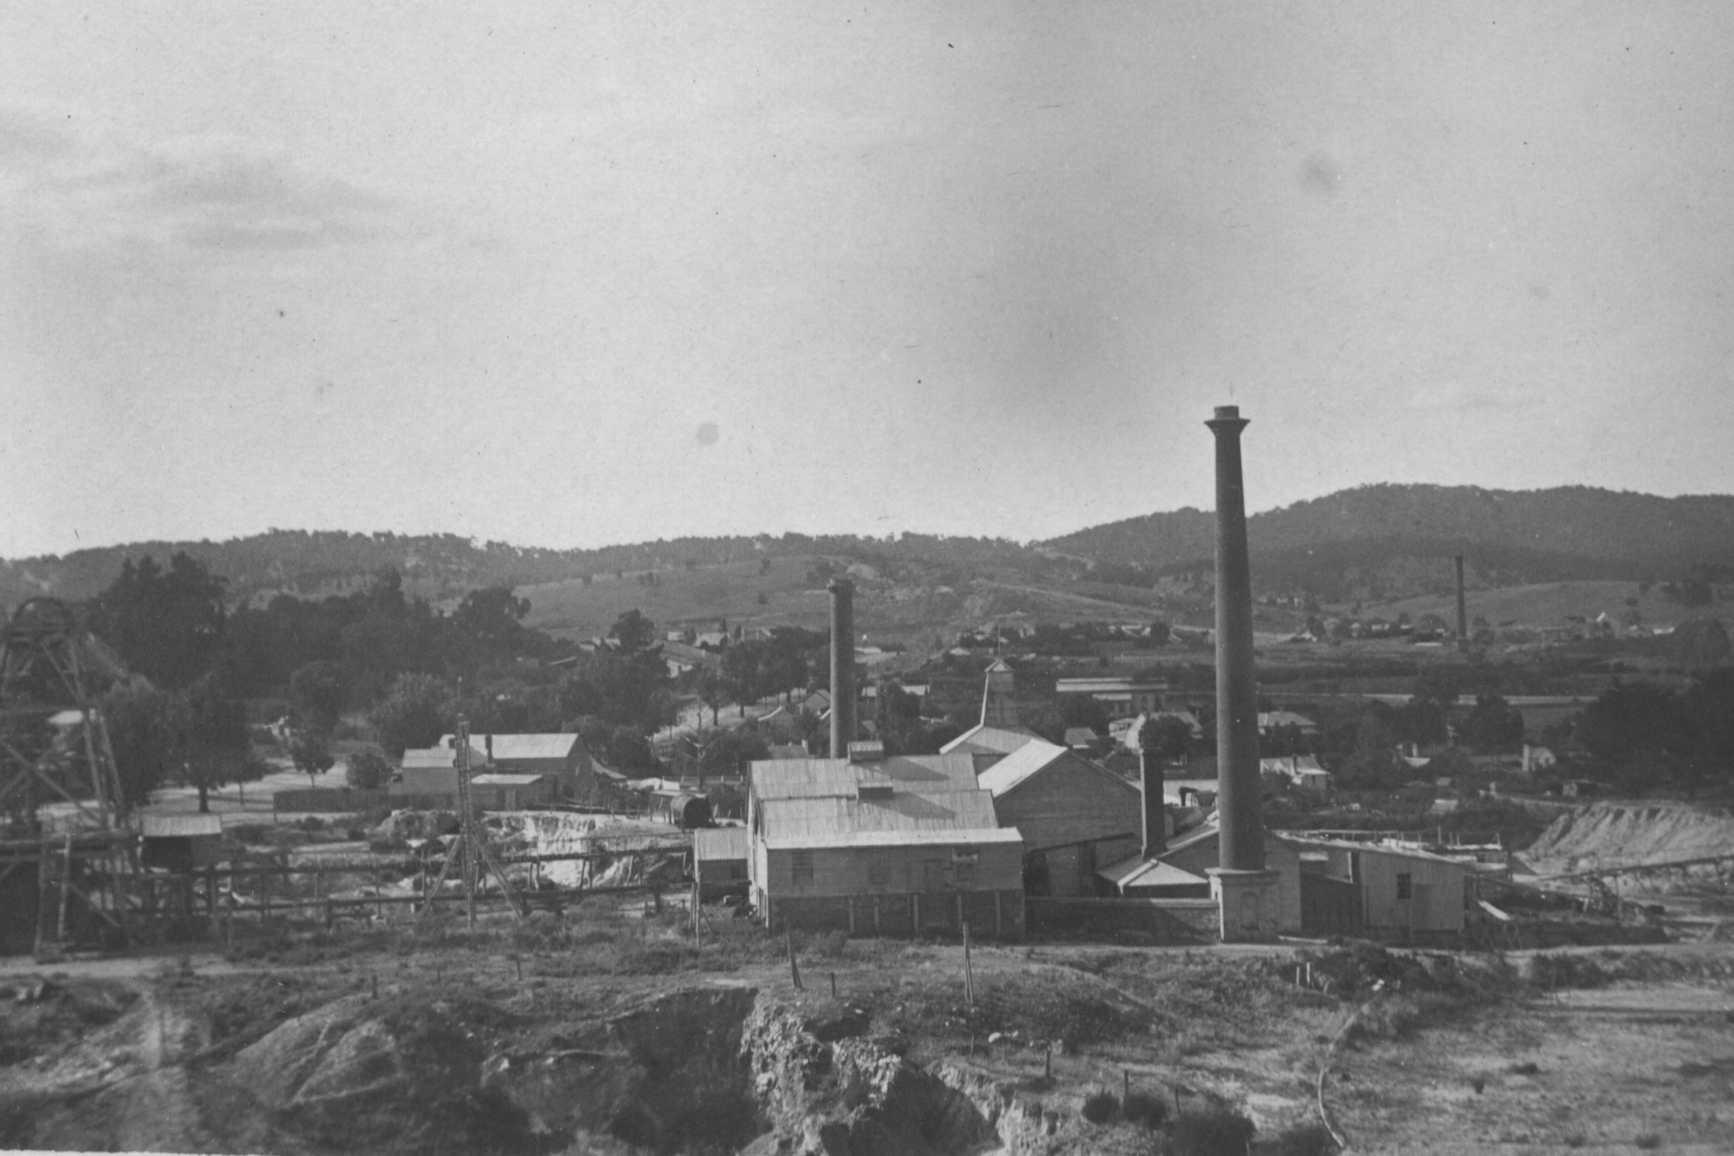 Beehive Mine Site